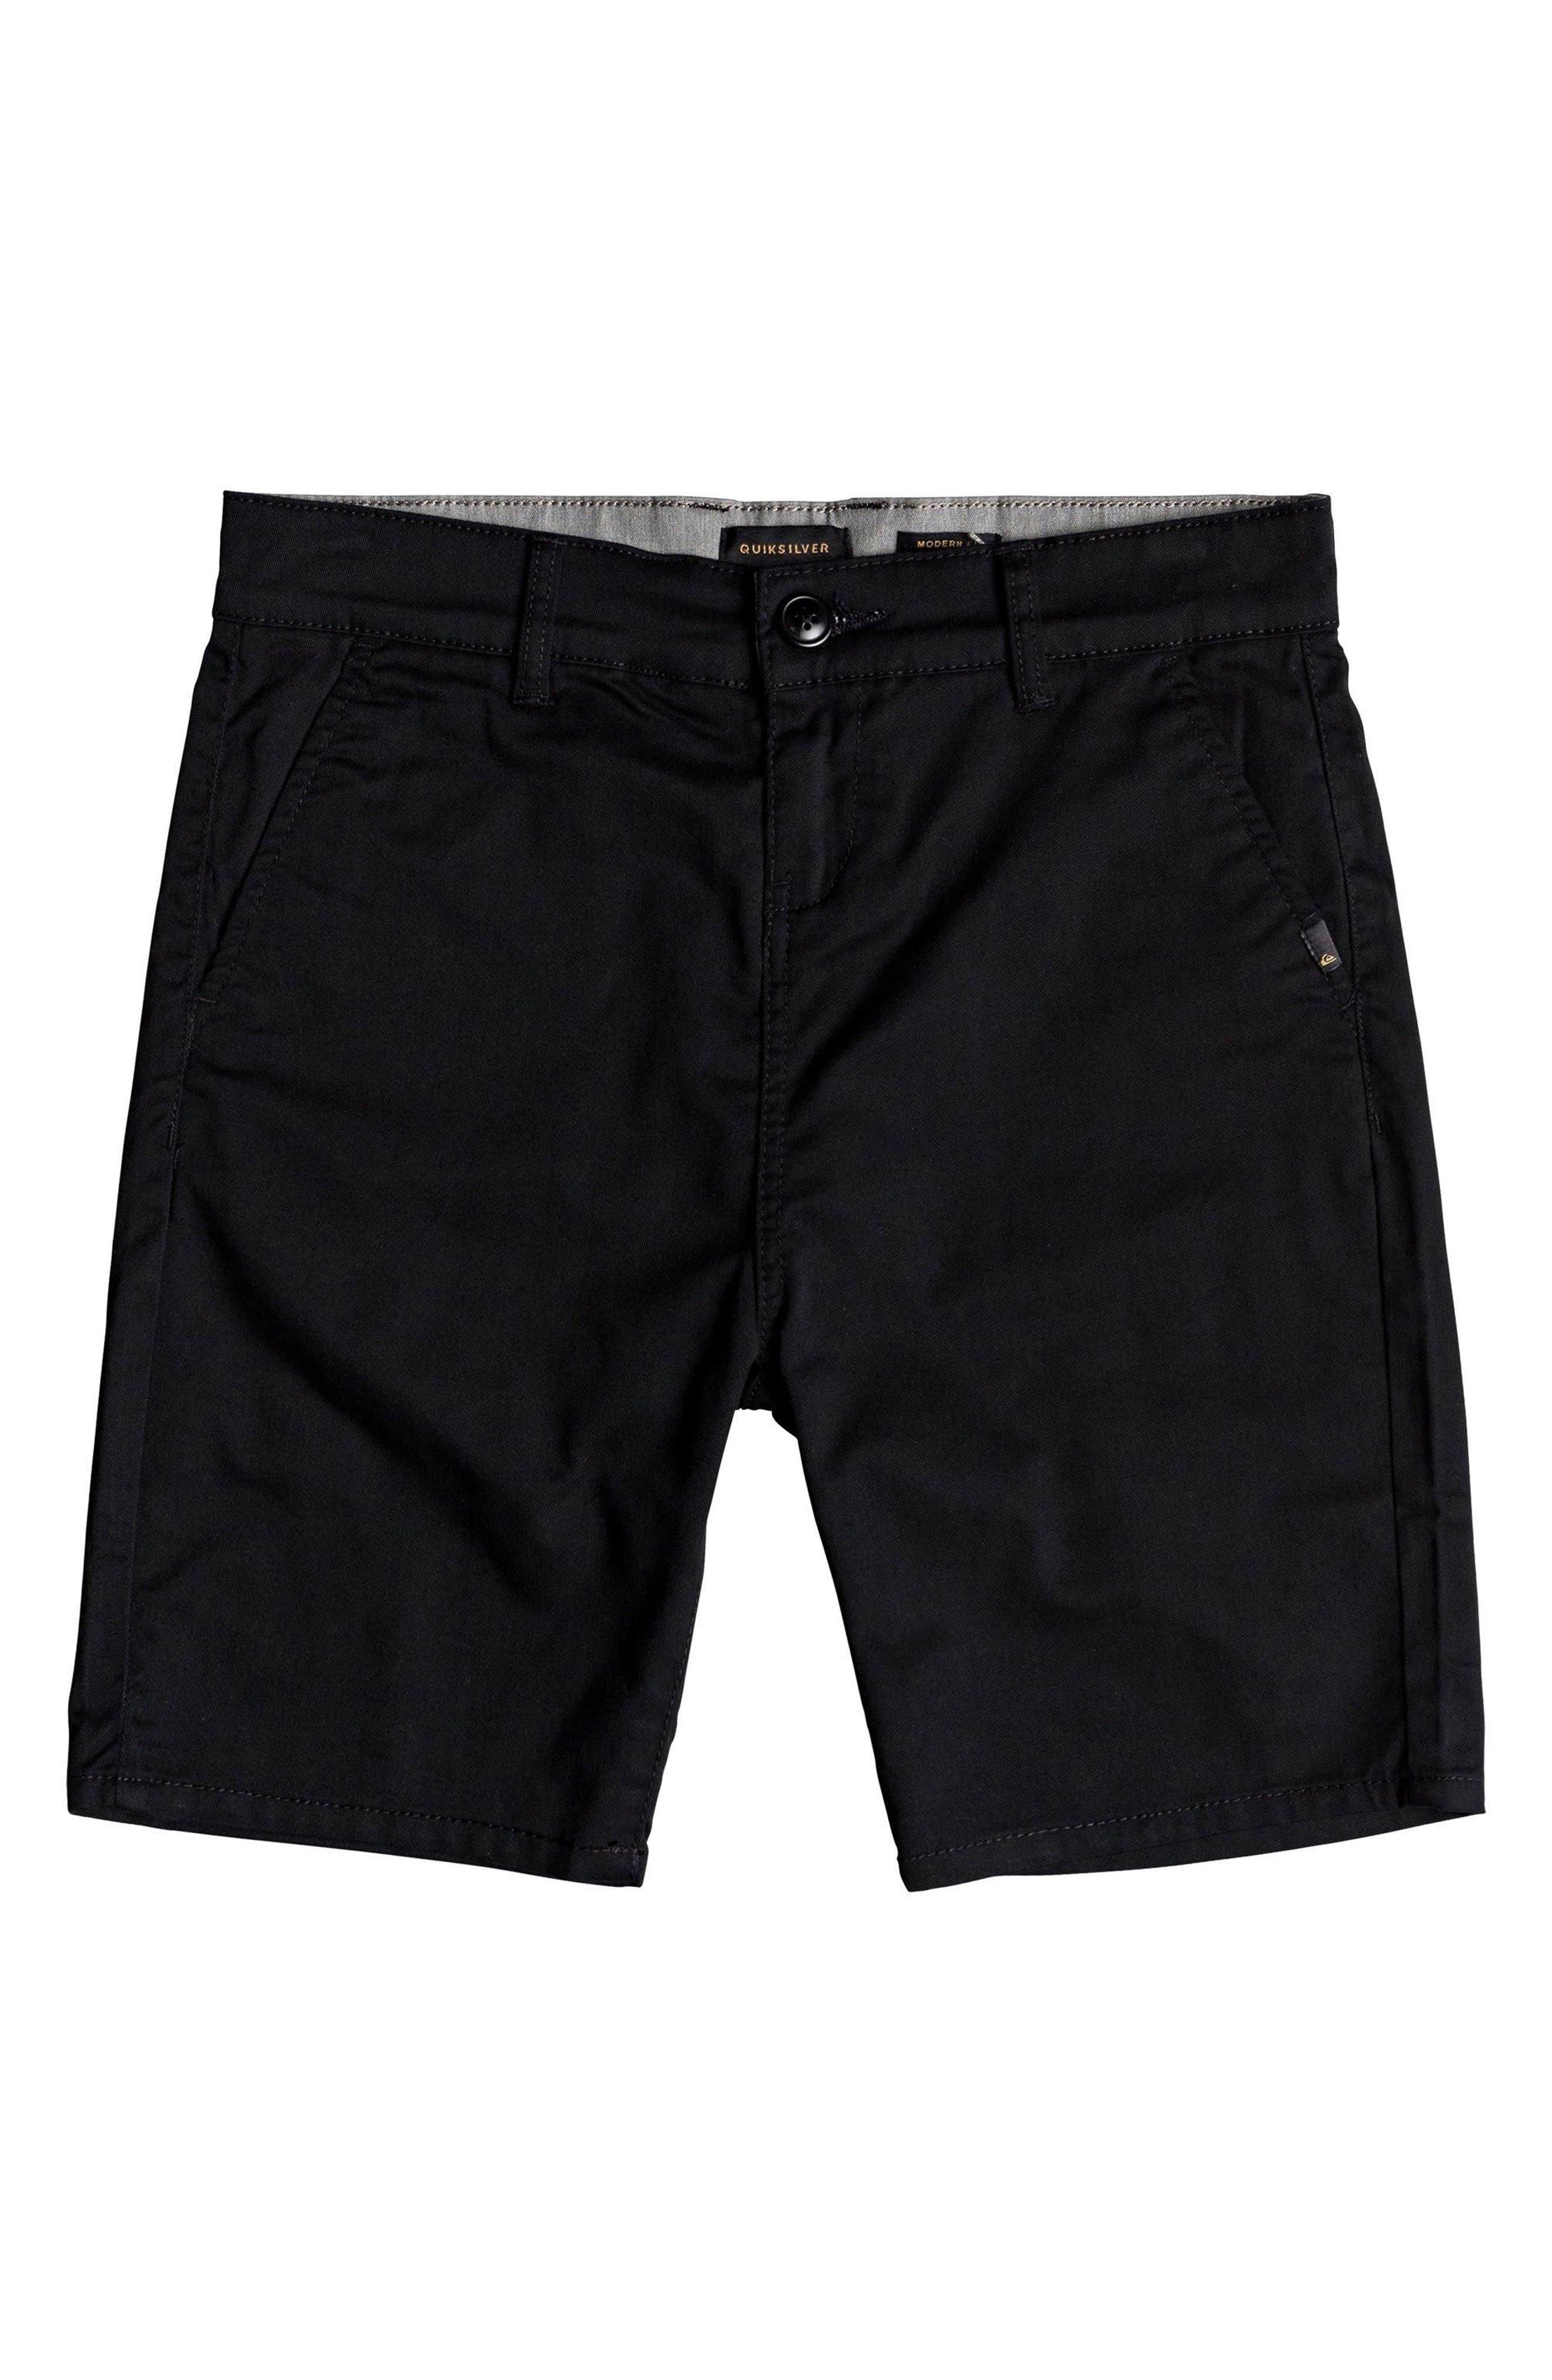 Quiksilver Everyday Union Stretch Shorts (Big Boys)